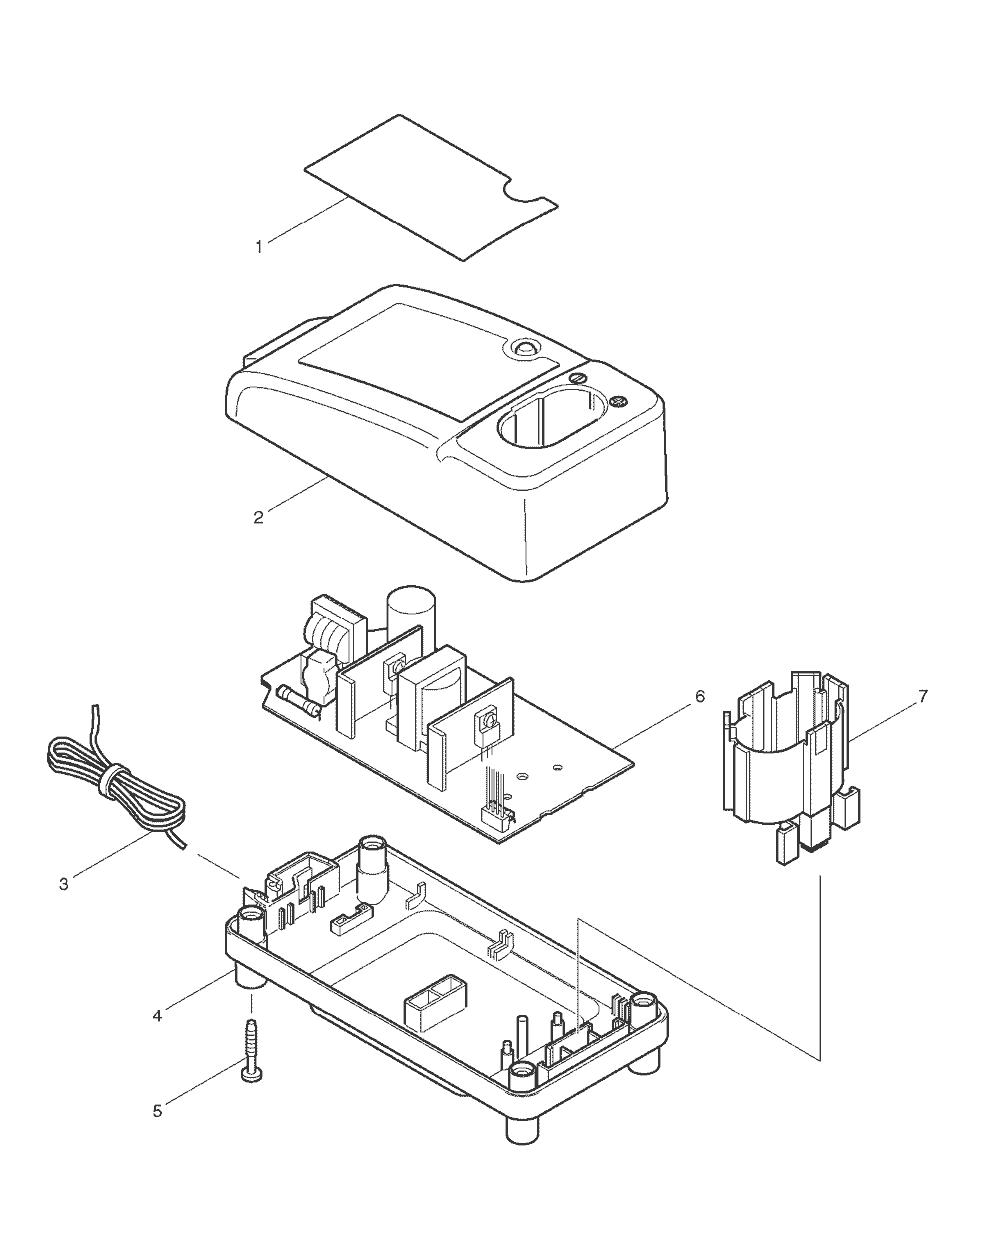 MAKITA WIRING DIAGRAM - Auto Electrical Wiring Diagram on